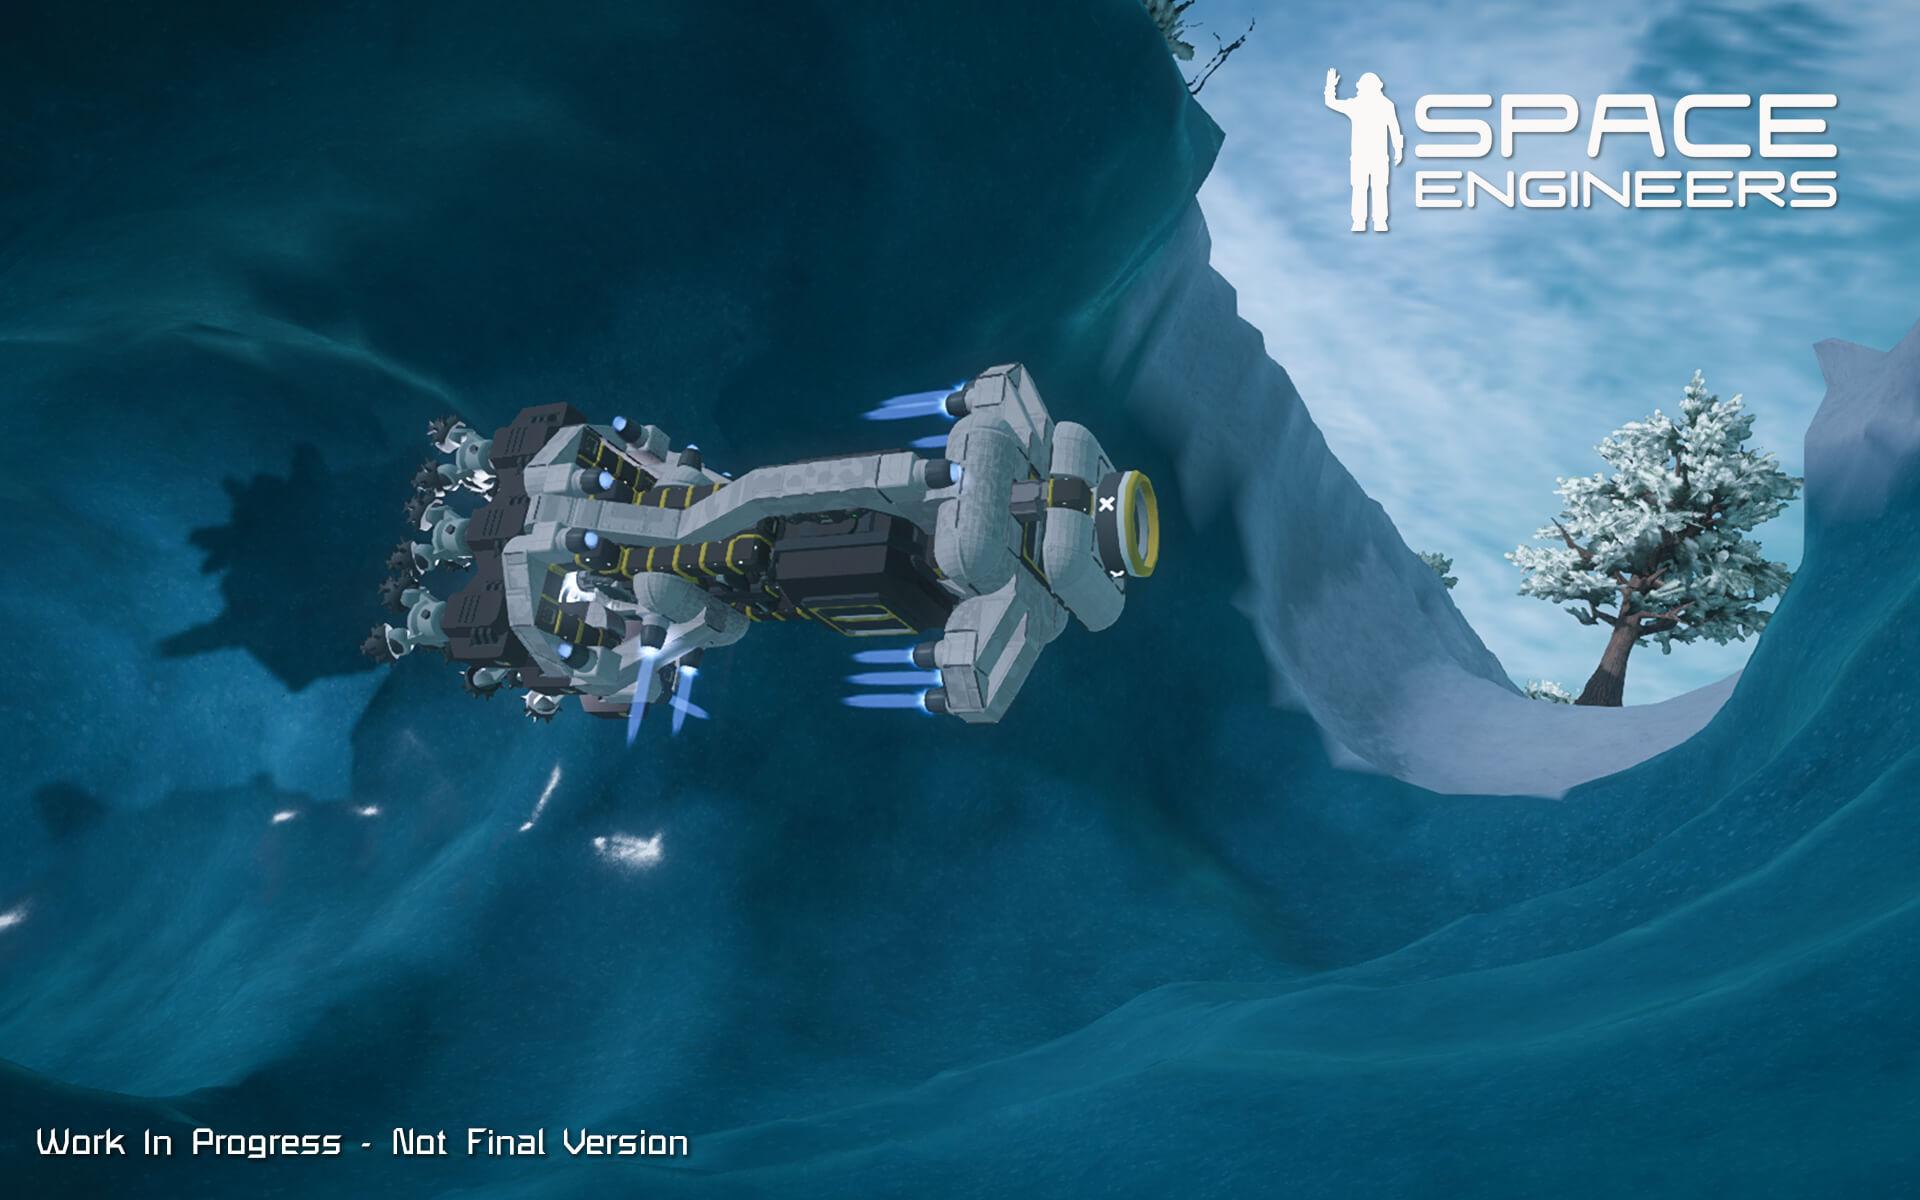 moon base space engineers - photo #30